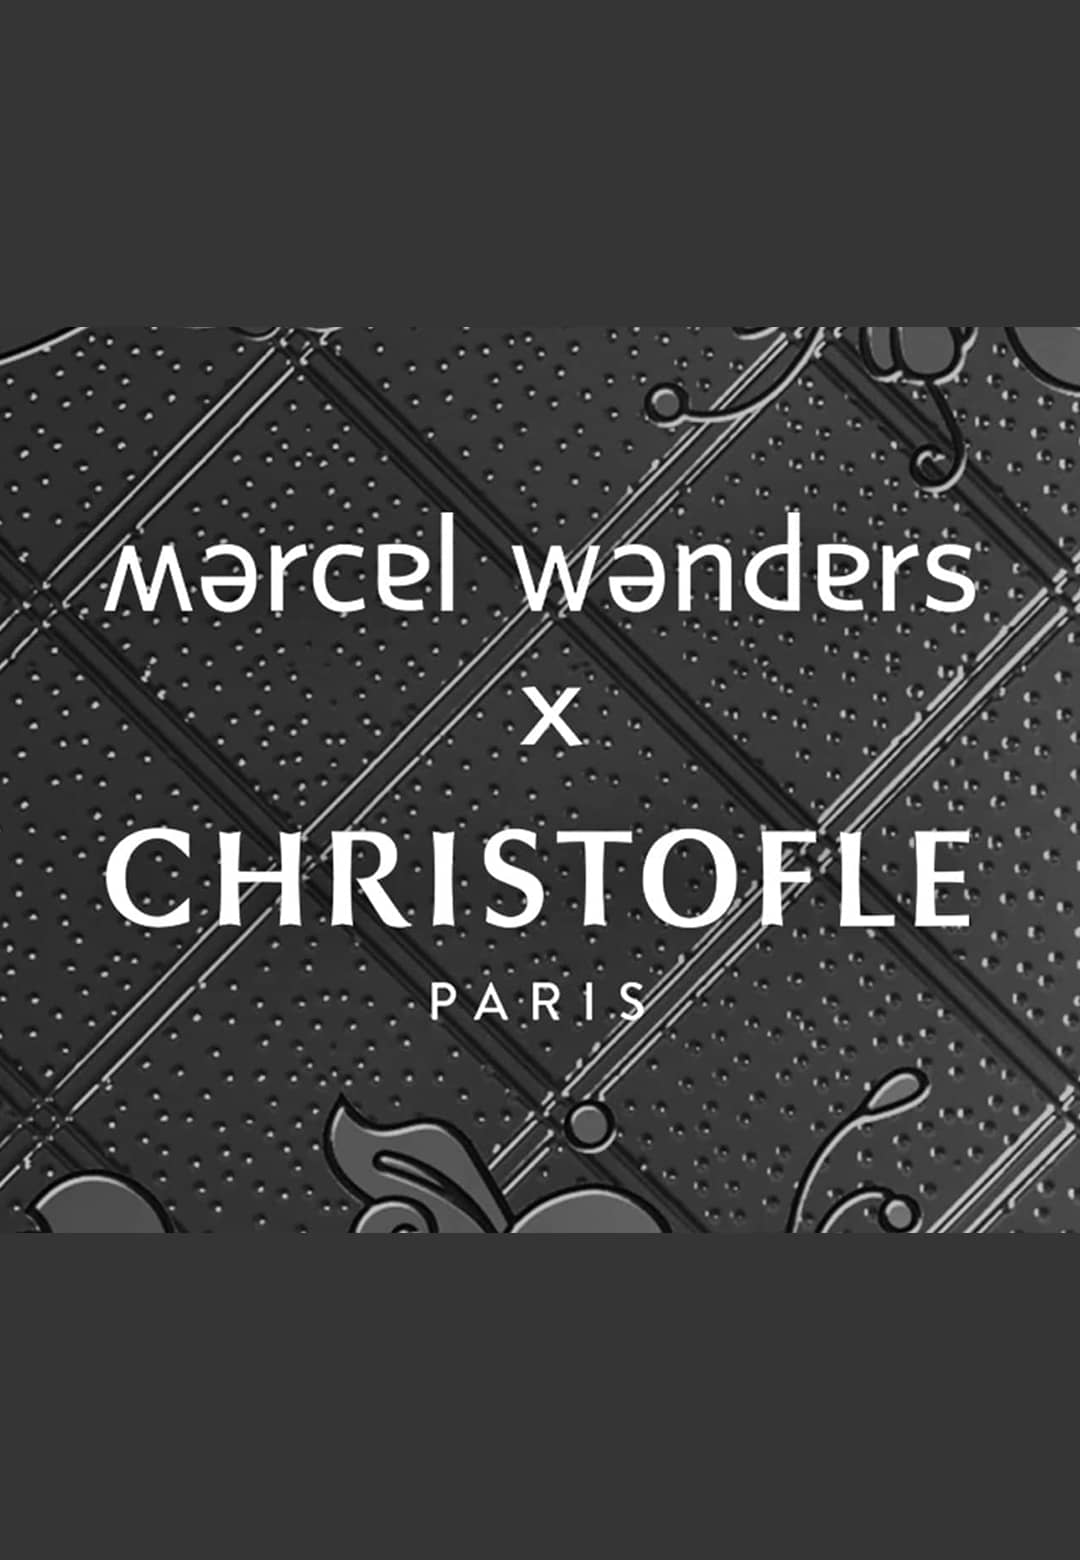 Jardin d'Éden by Marcel Wanders studio for Christofle, 2021